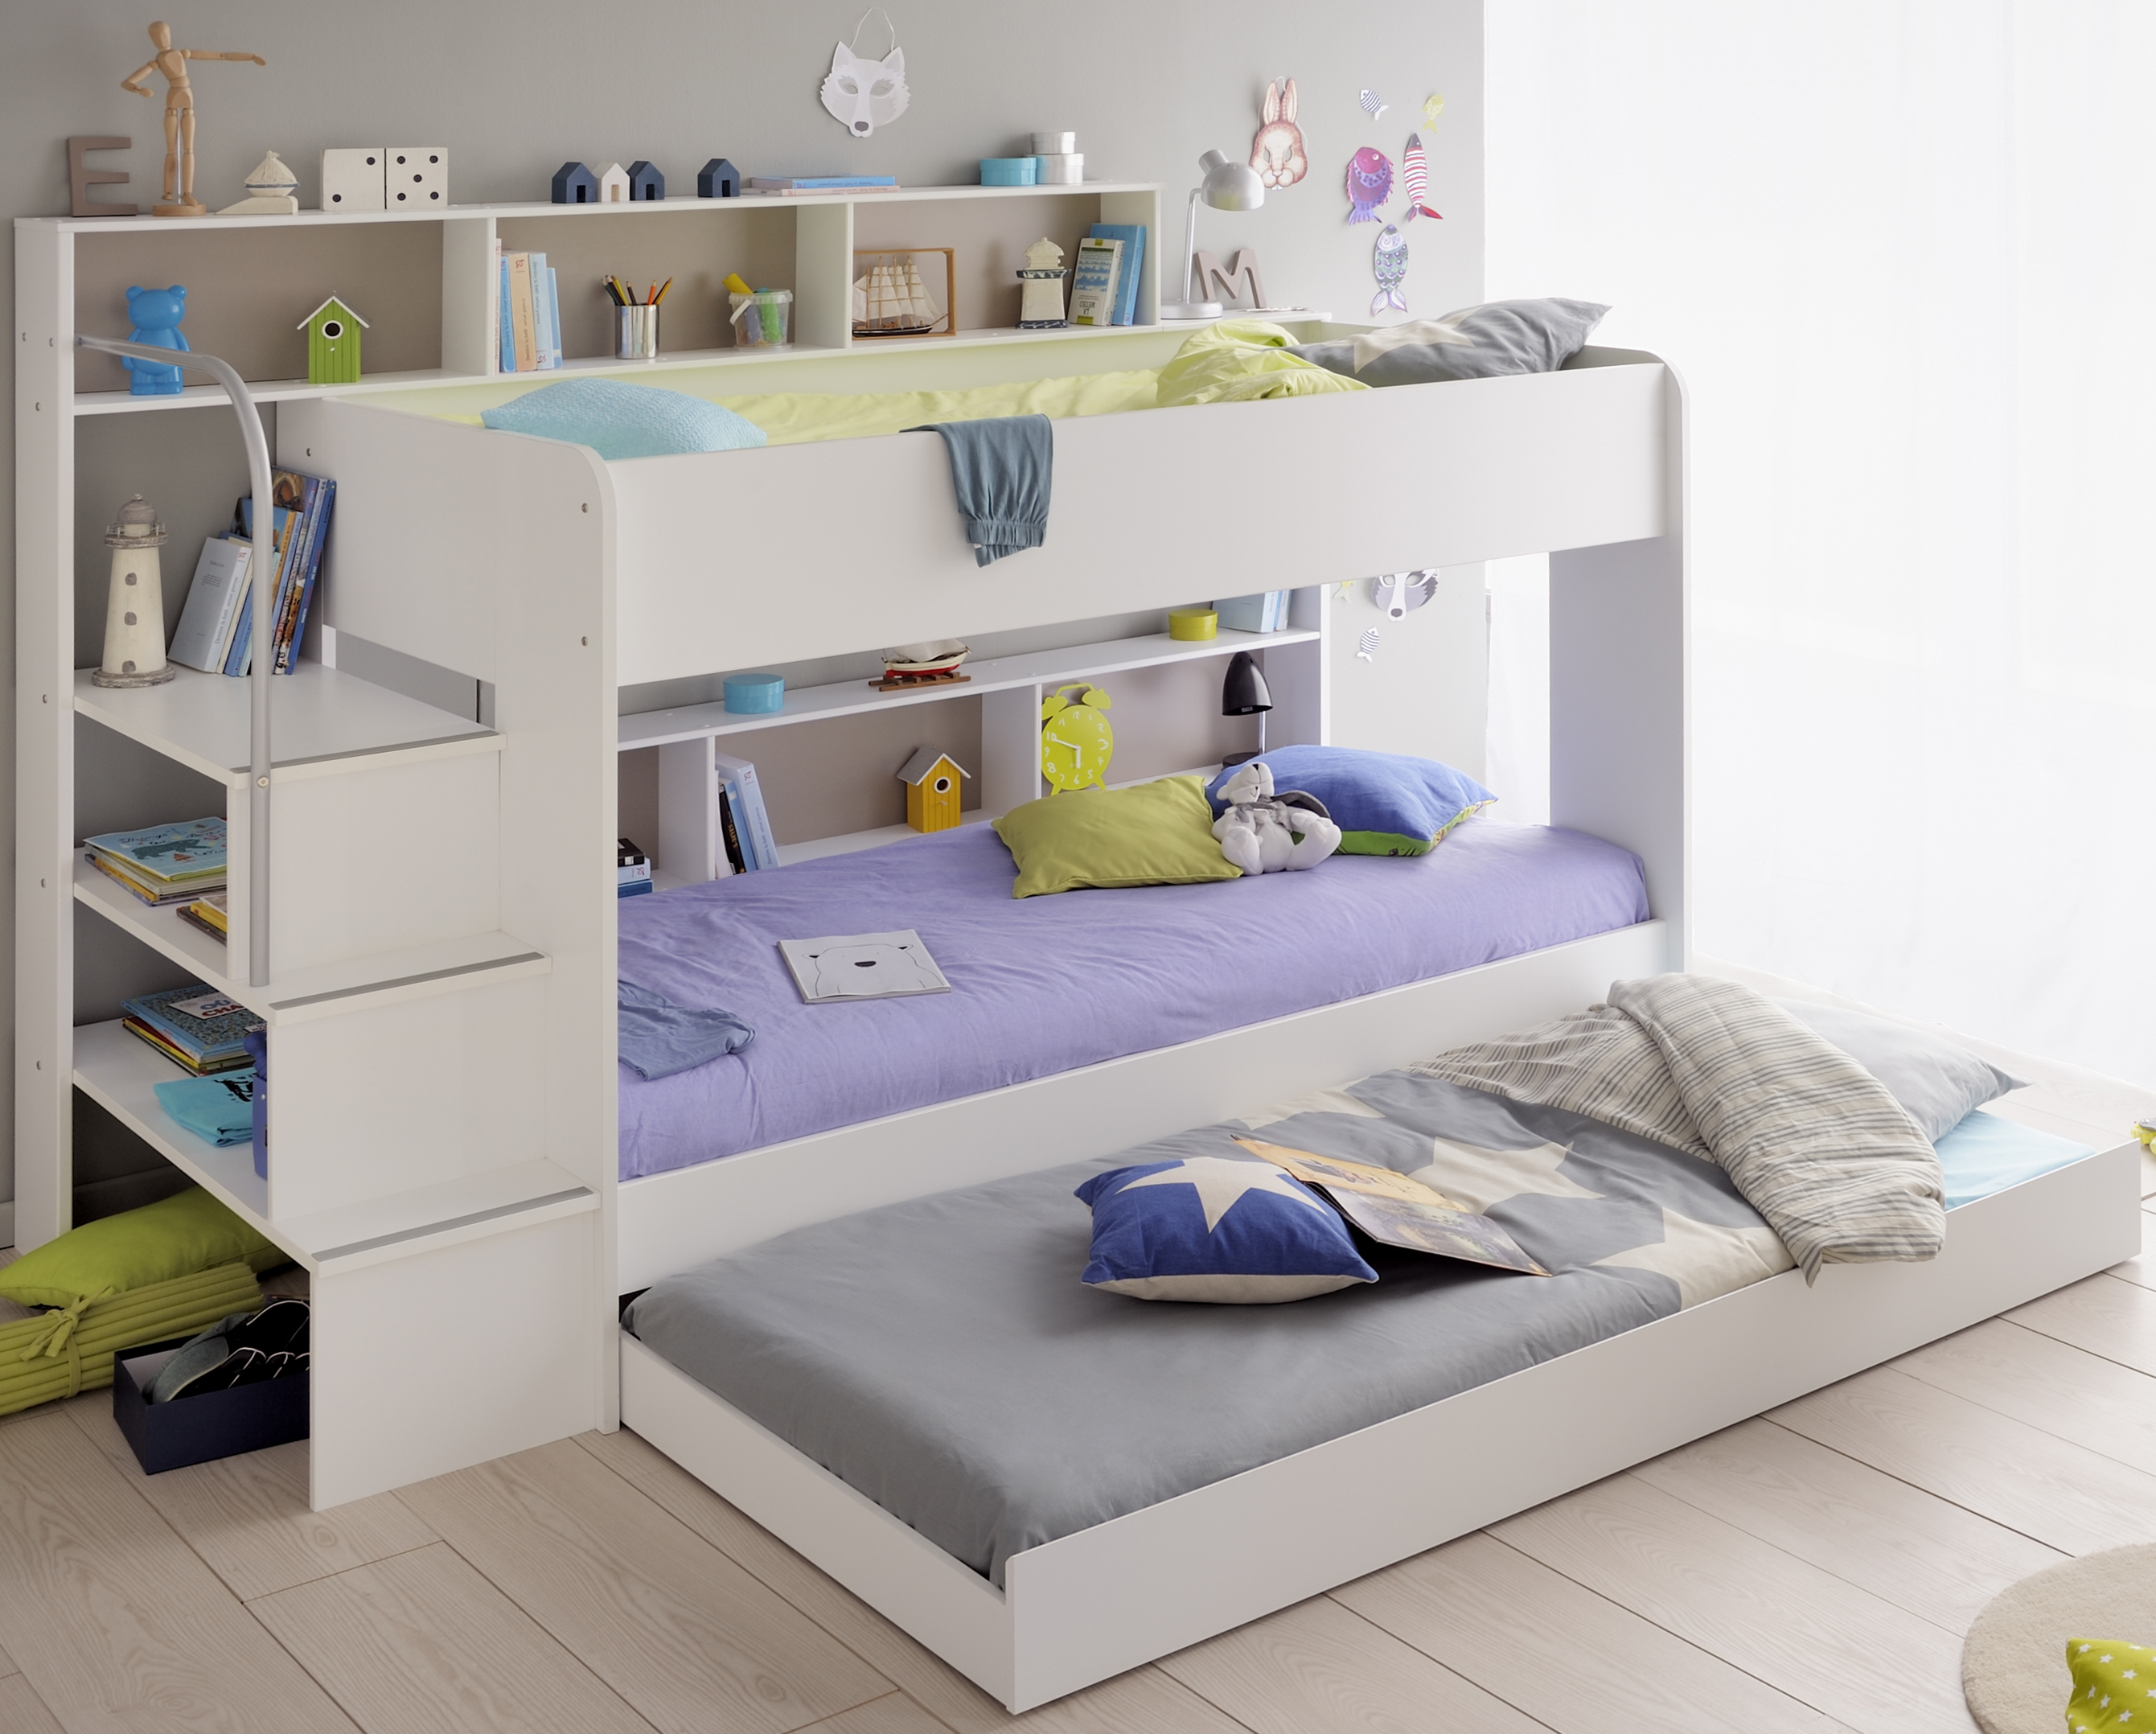 Etagenbett Set : Kinderzimmer set 3 tlg inkl 90x200 etagenbett bettkasten u